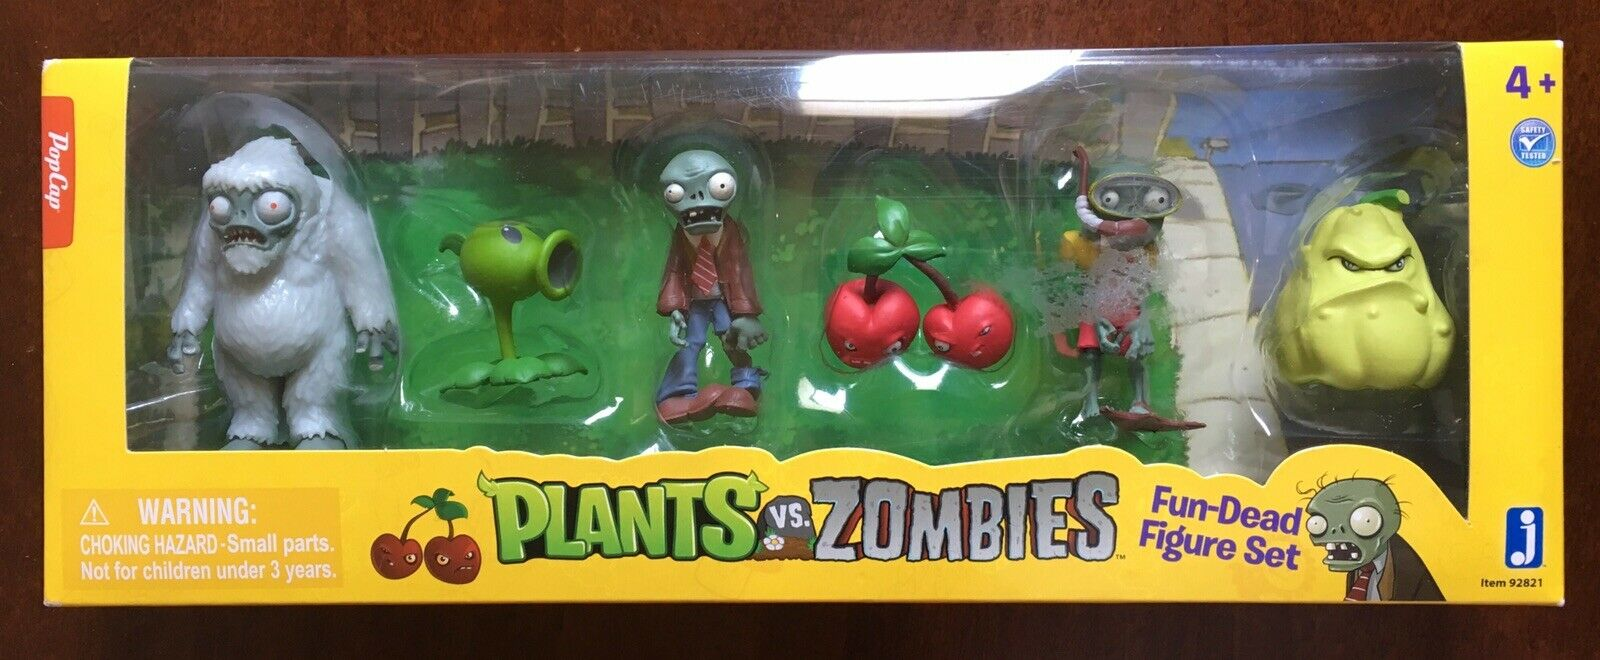 Plants vs Zombies Fun-Dead Mini Figure 6-Pack Rare OOP Box Set (NEW, SEALED)